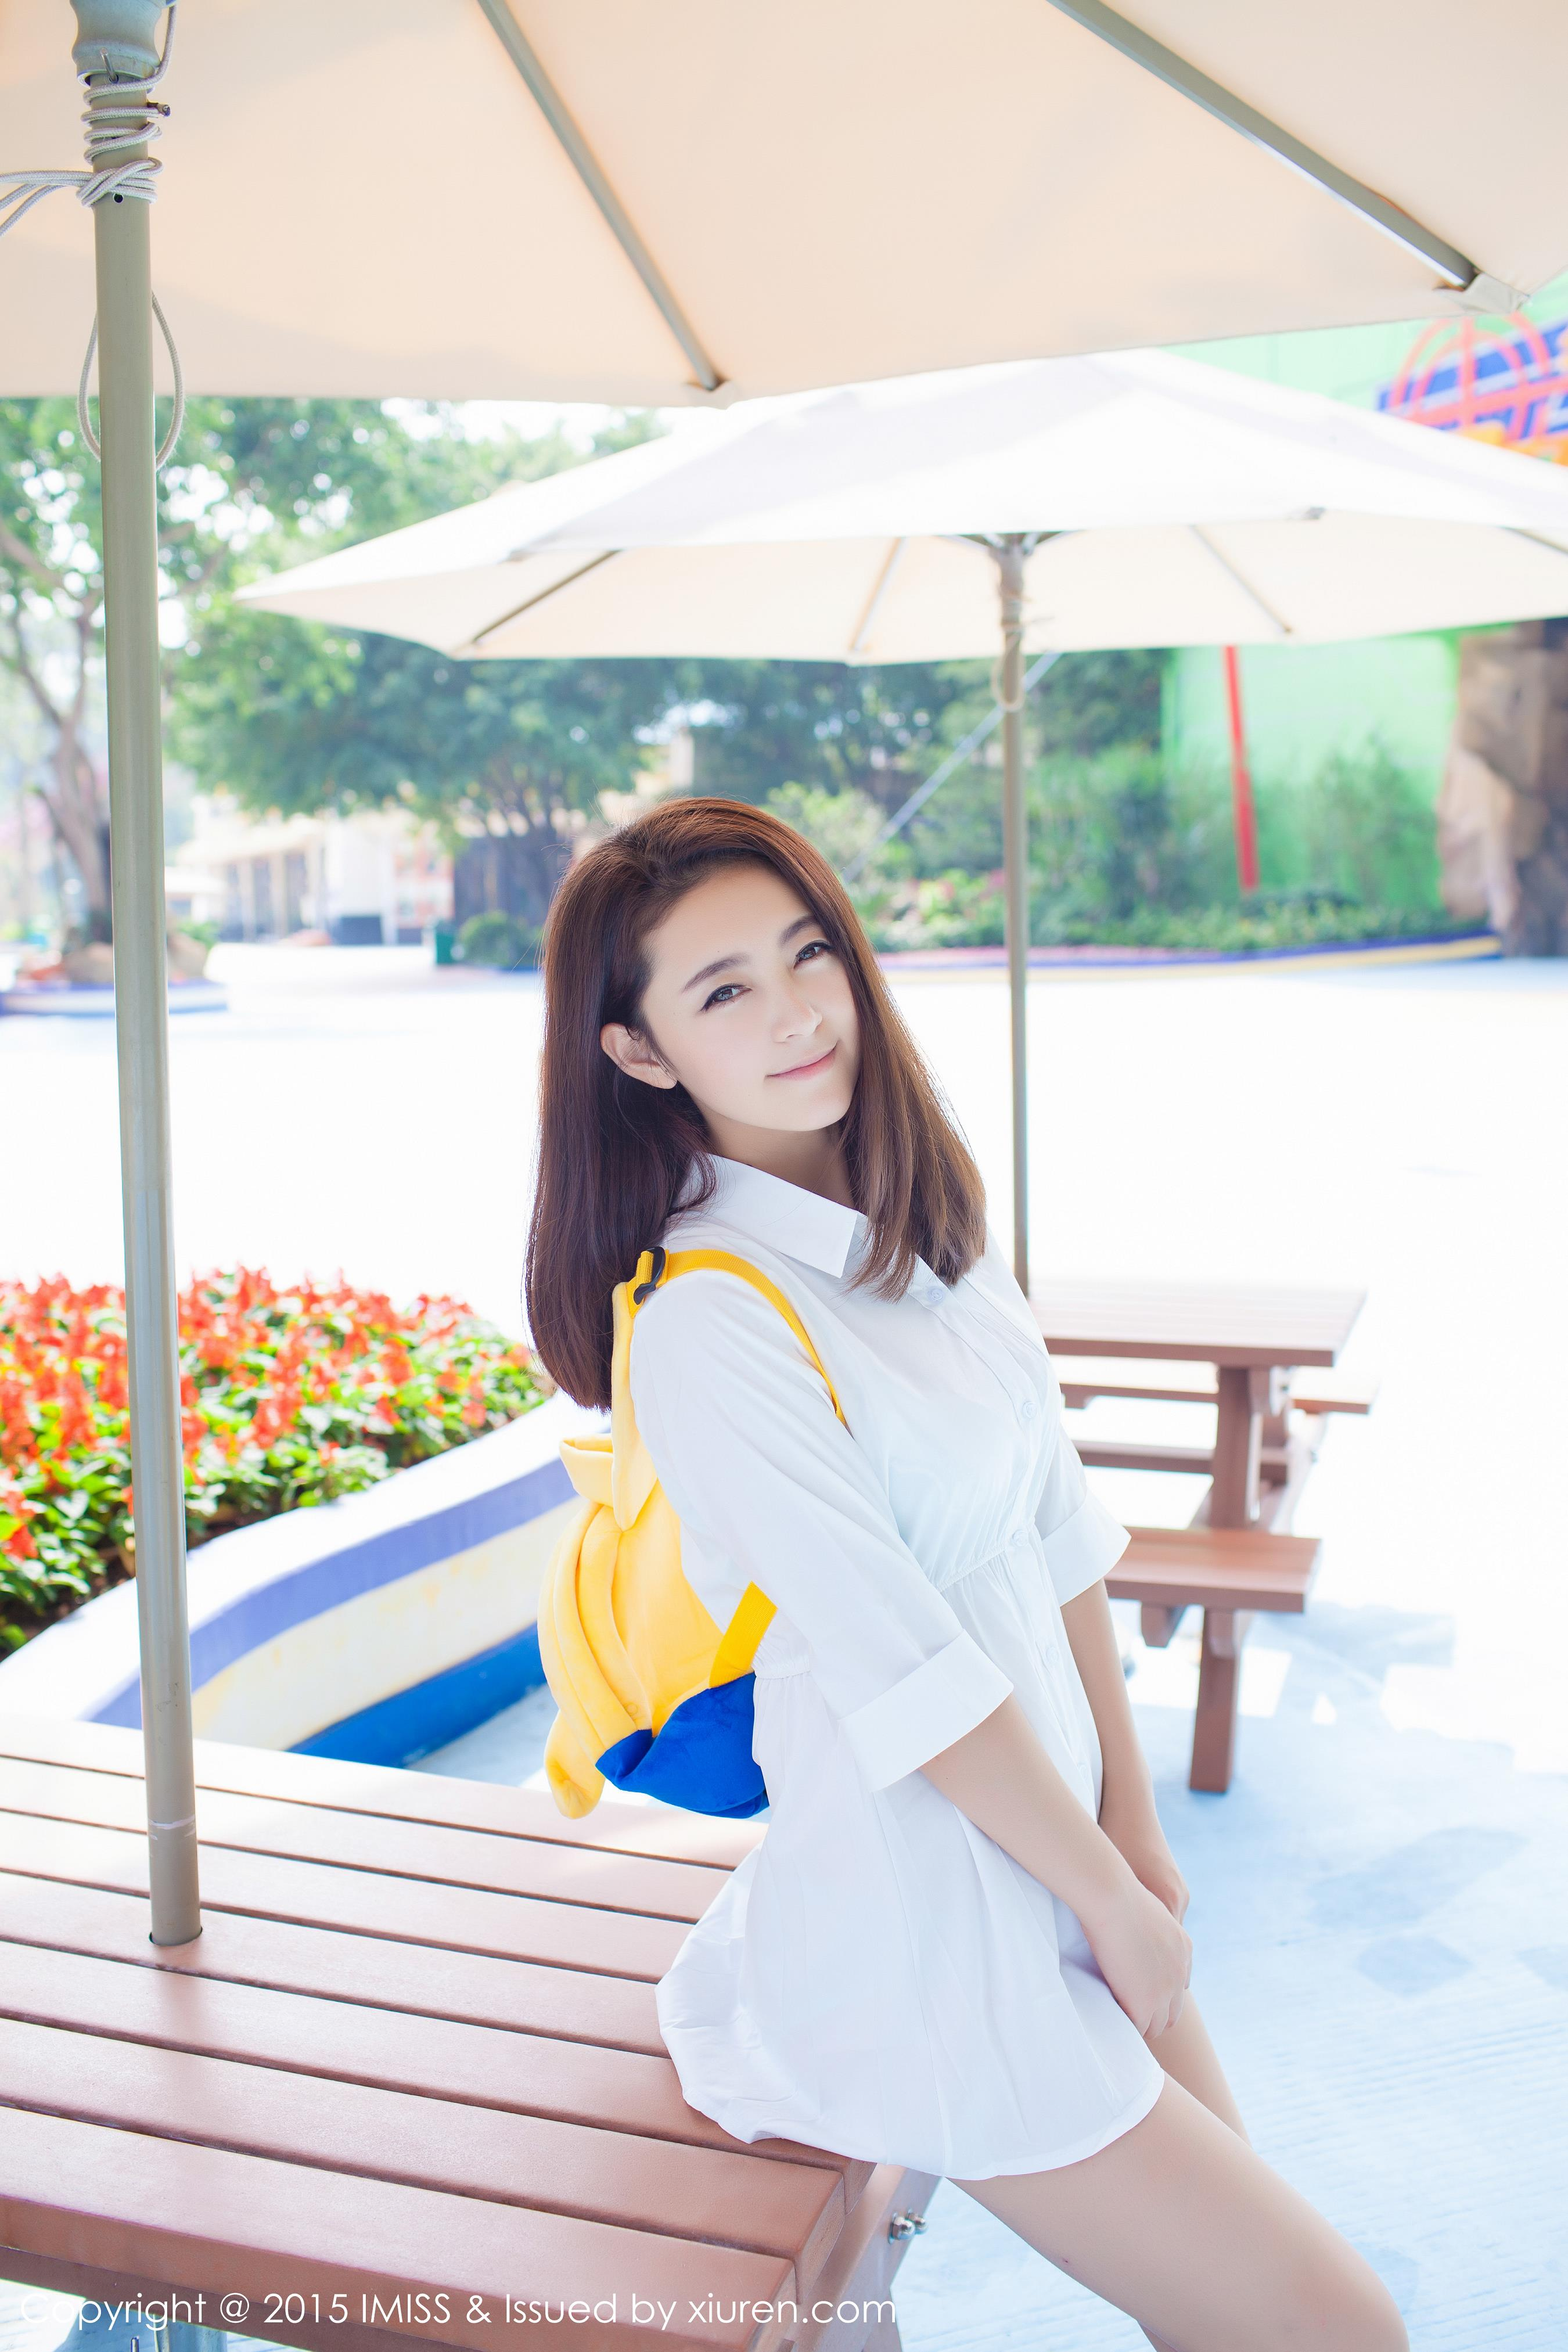 [IMISS爱蜜社]IMS20151217VOL0053 夏茉GIGI 白色衬衫加性感内衣与比基尼泳装私房写真集